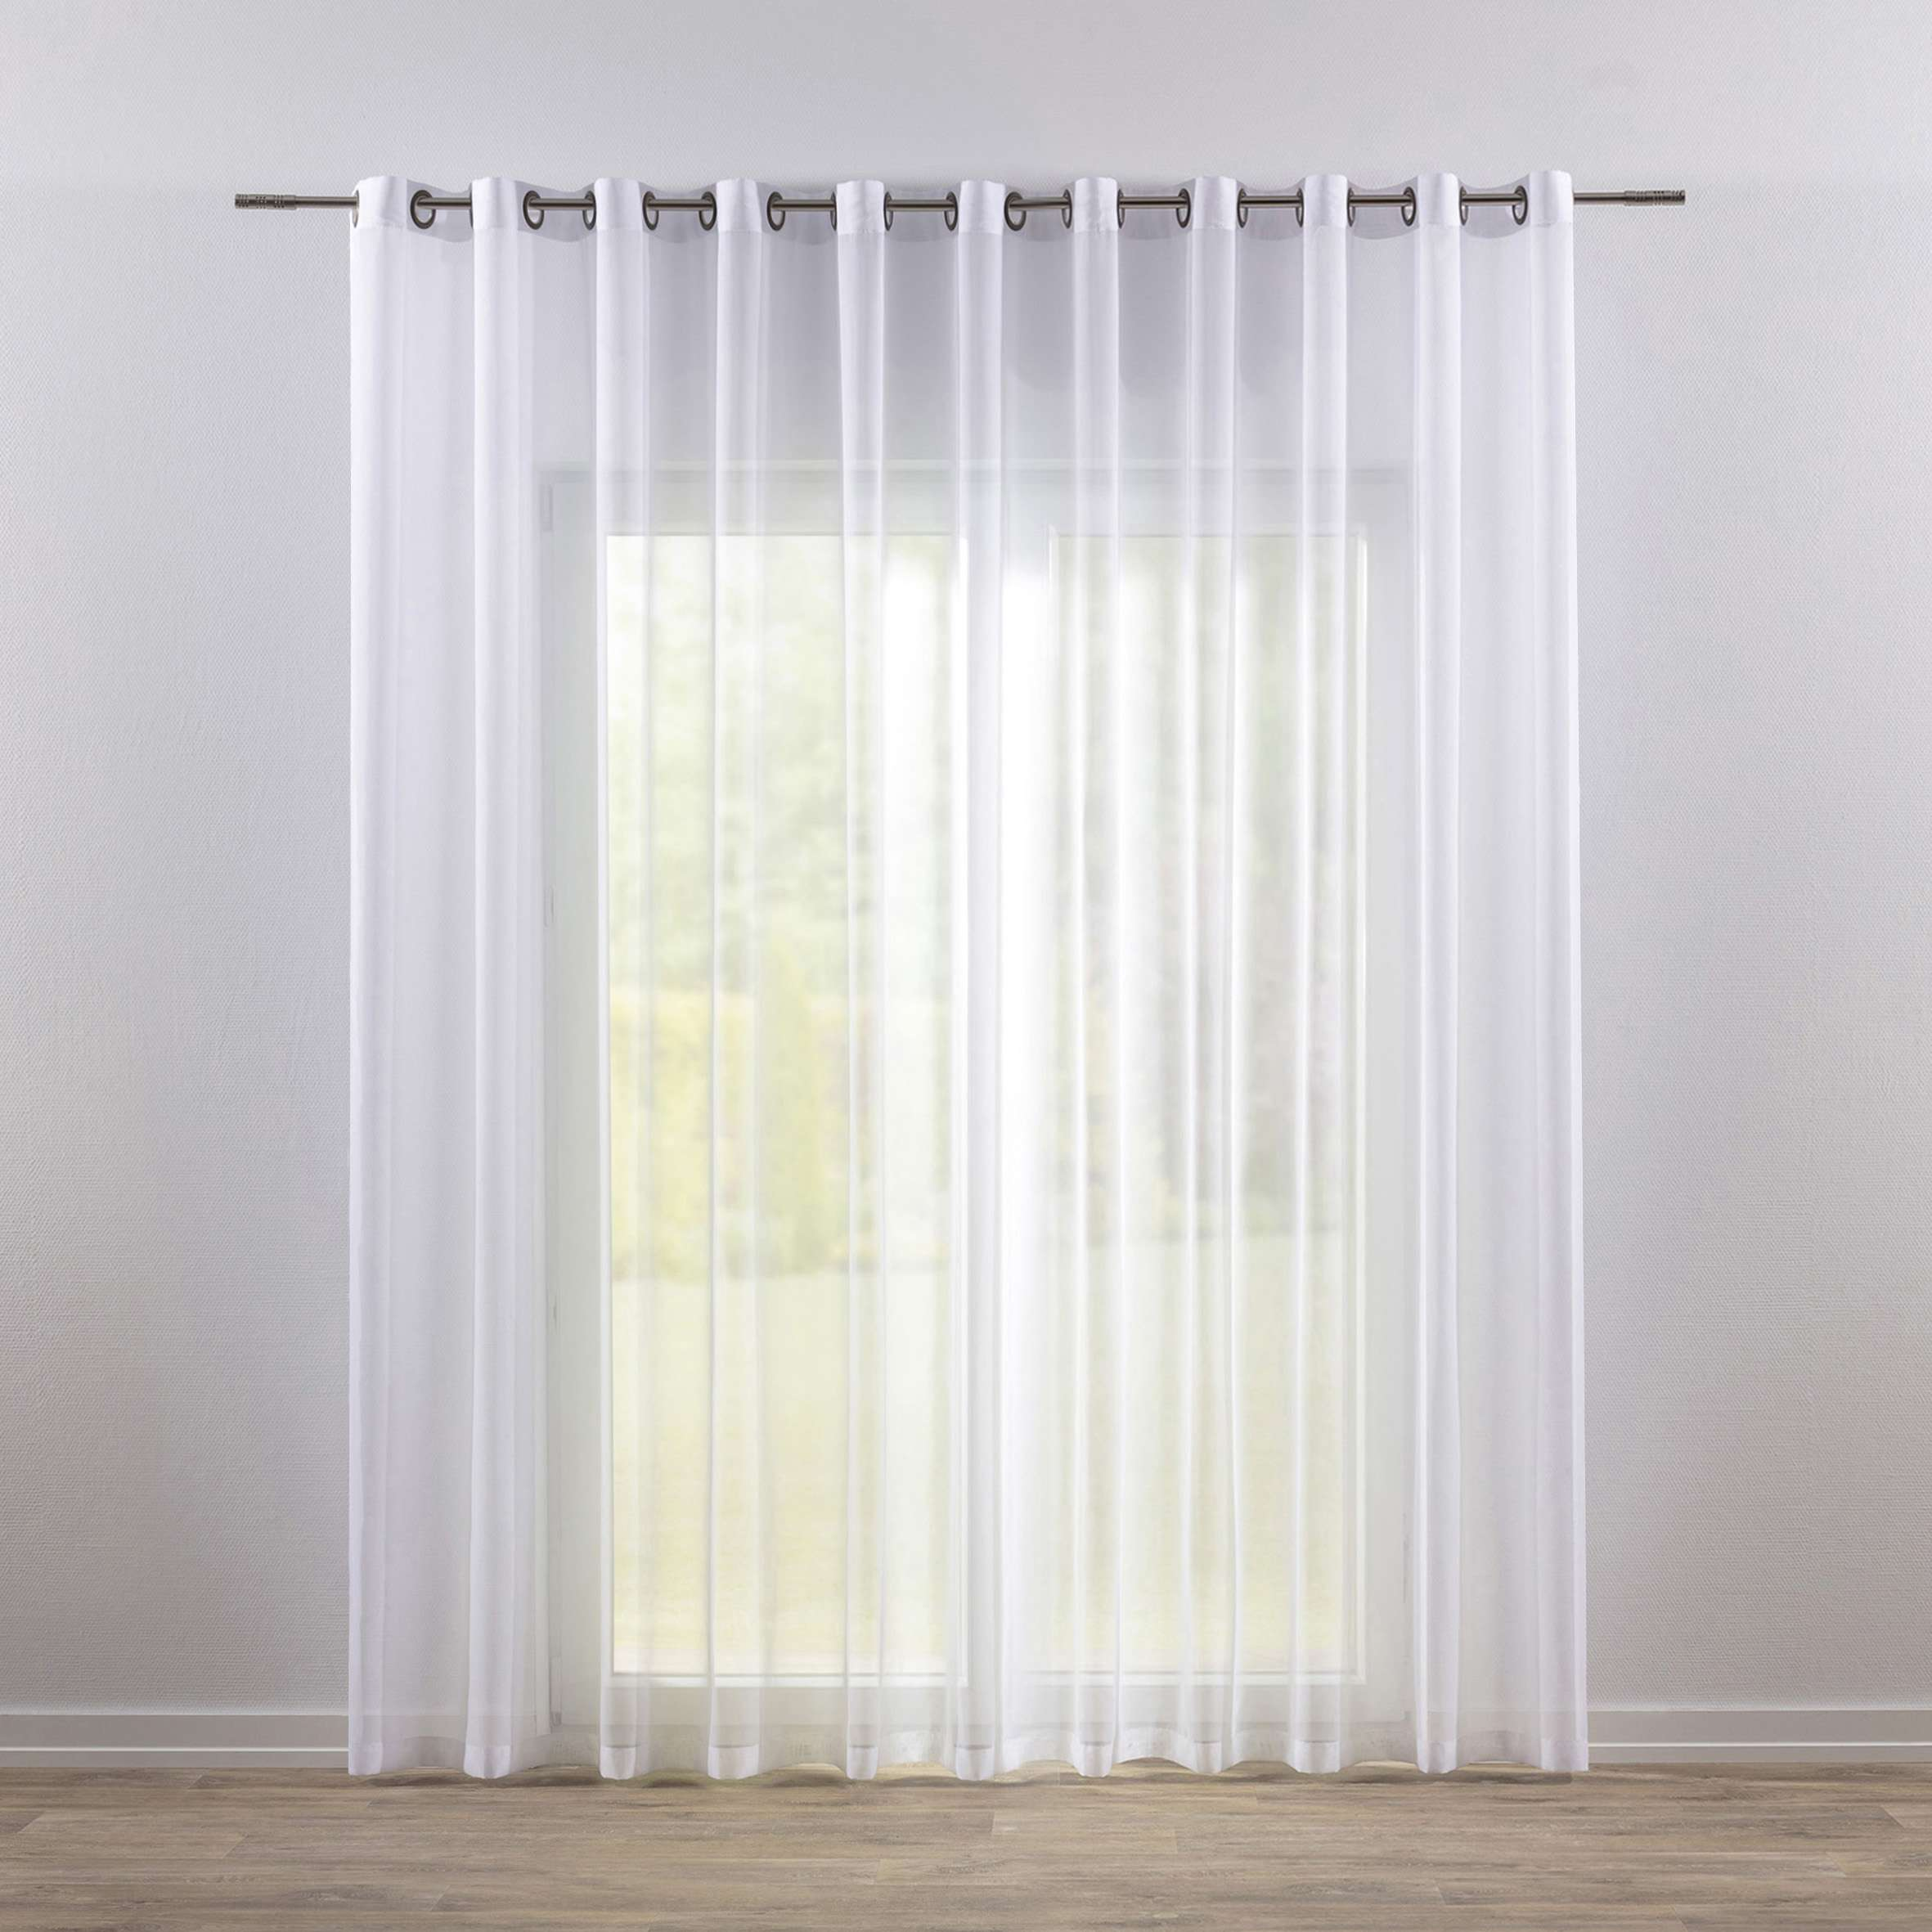 Eyelet Voile Net Curtains White Dekoria